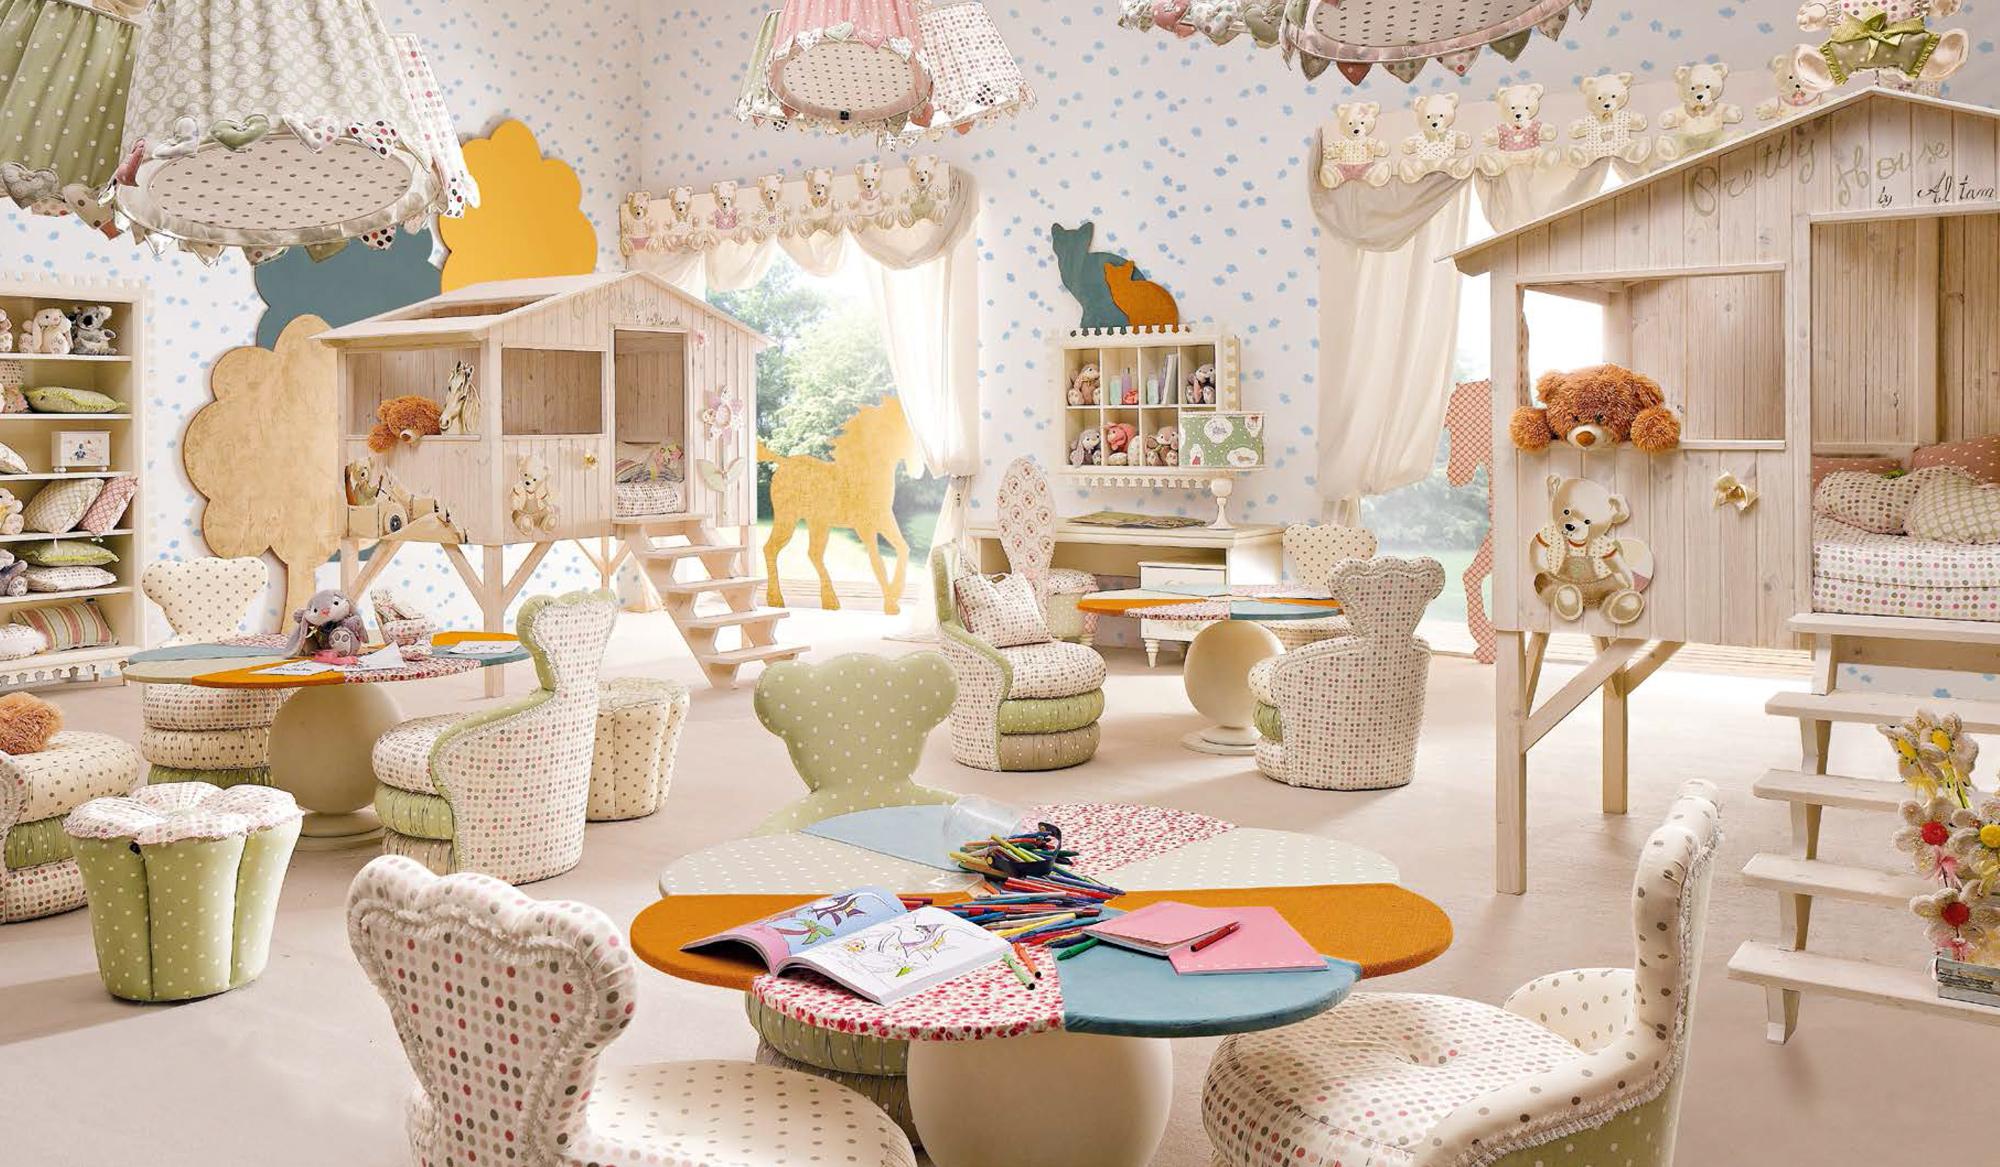 lit d enfant original ikea kura tente dans un lit. Black Bedroom Furniture Sets. Home Design Ideas